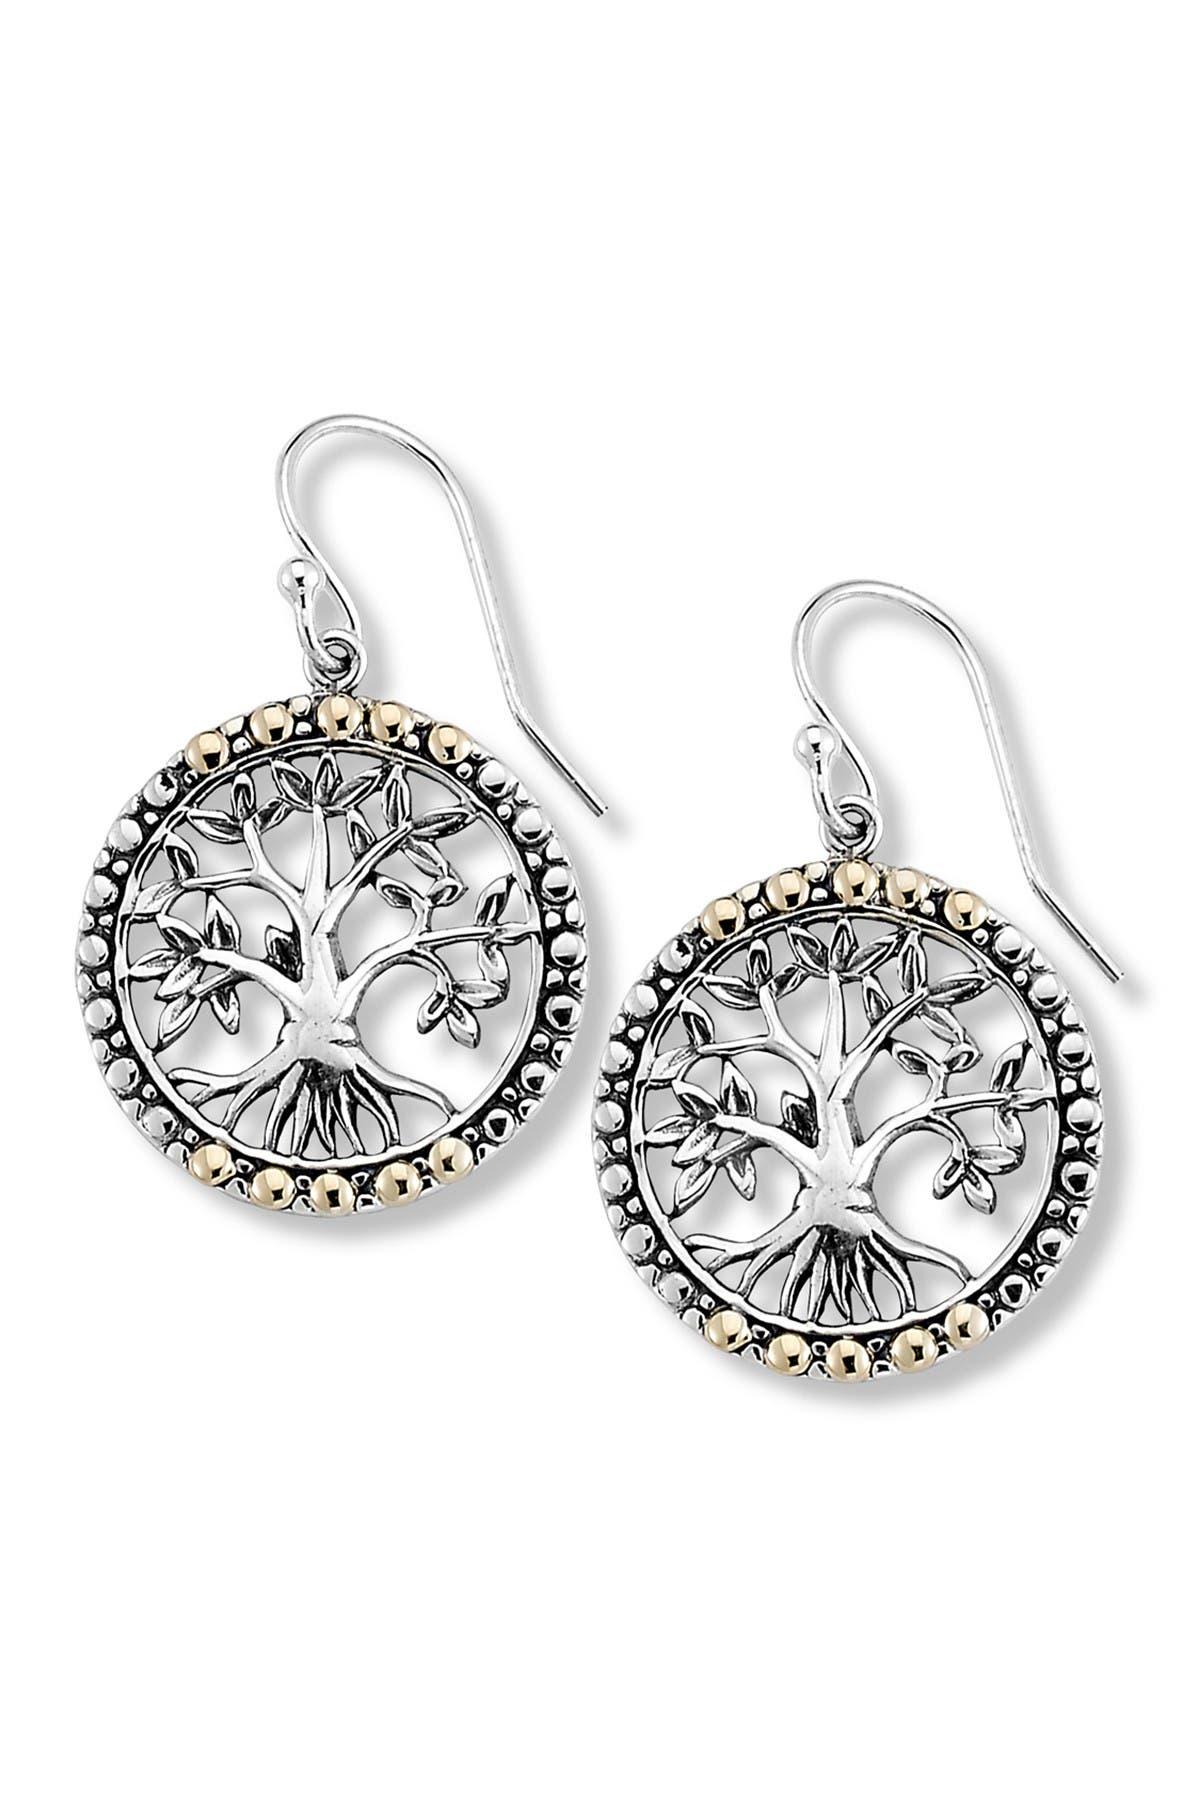 Image of Samuel B Jewelry Sterling Silver & 18K Gold Tree of Life Earrings